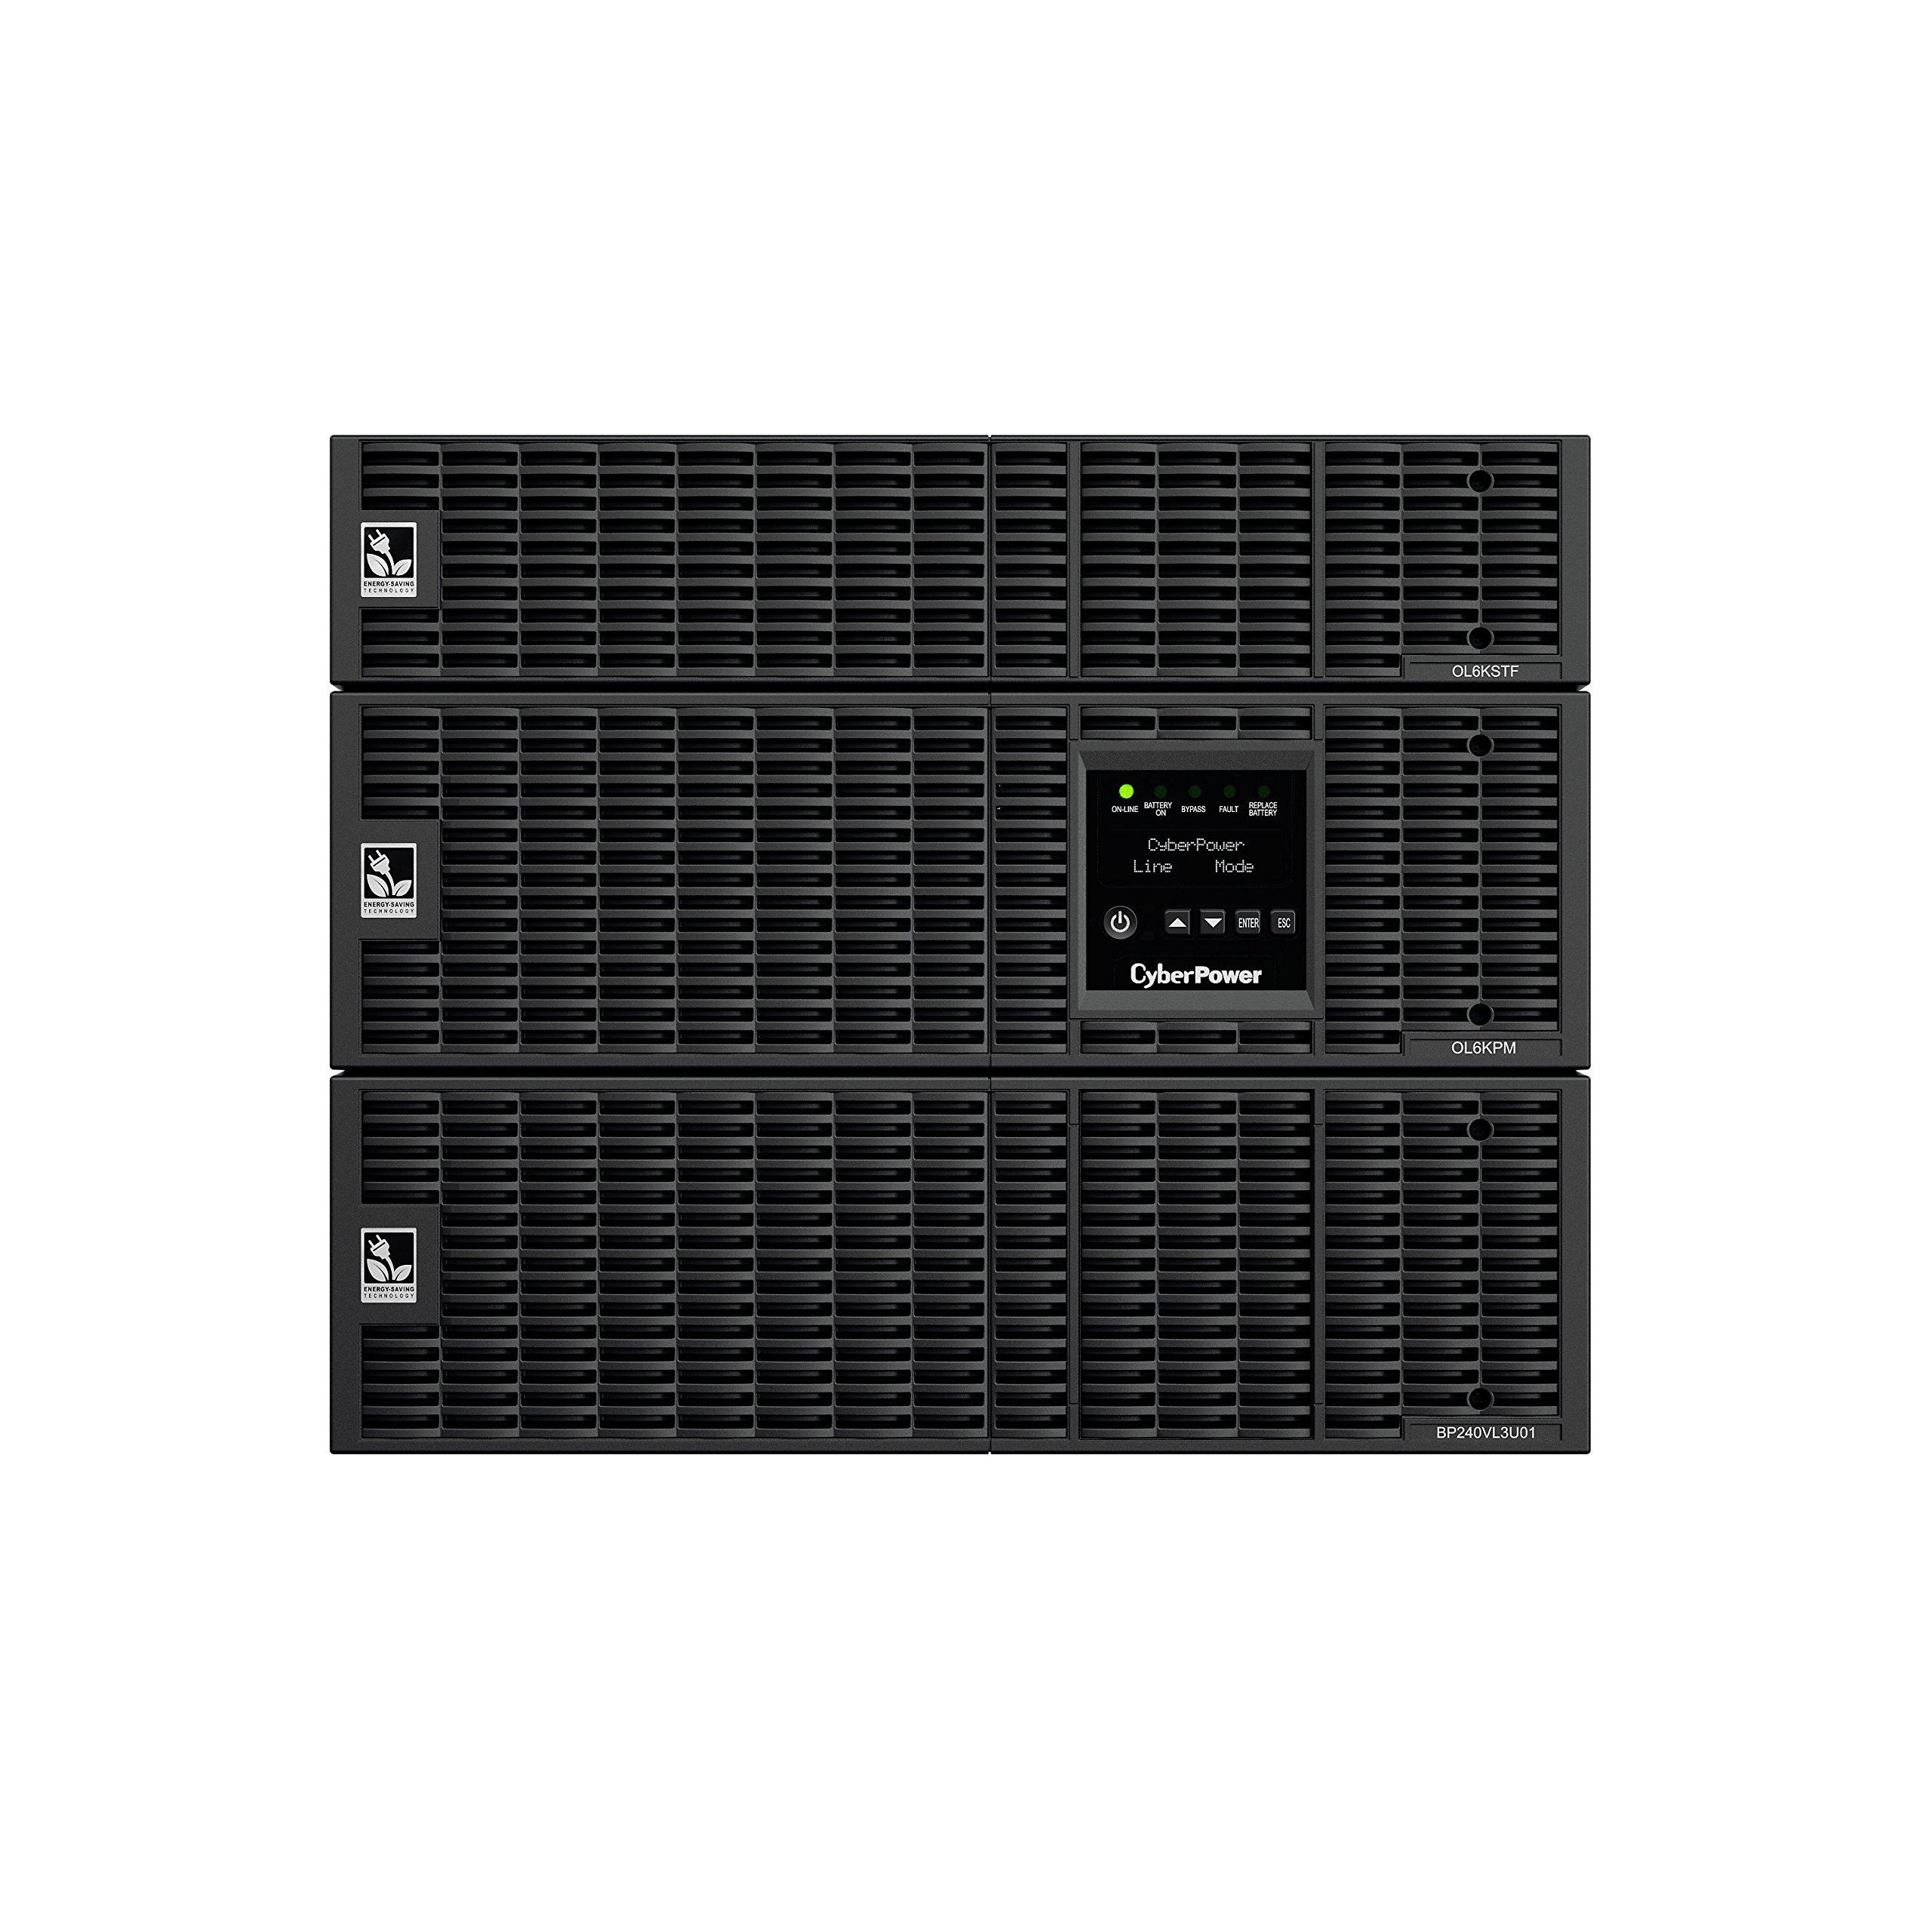 CyberPower OL6KRT Smart App Online UPS System, 6,000 VA/5,400 W, 4 Outlets, 6U Rack/Tower + Pre-Installed SNMP Card